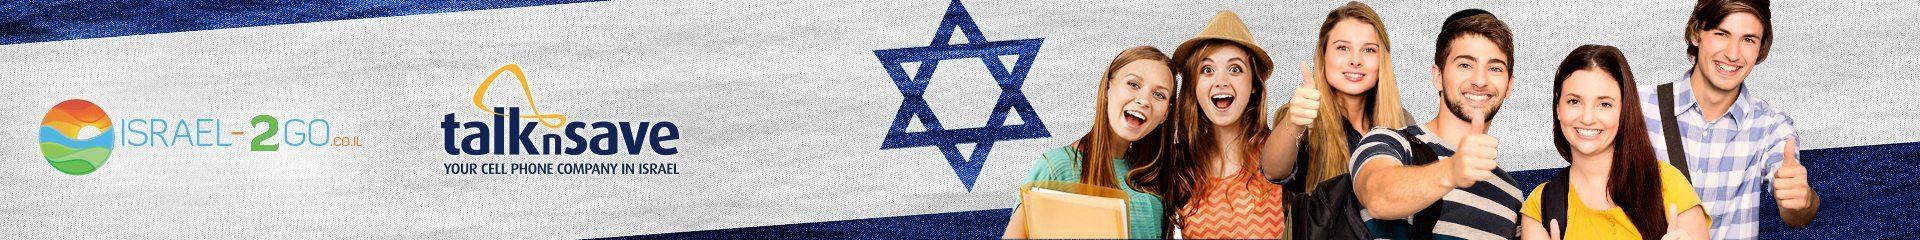 israel2go-Banner